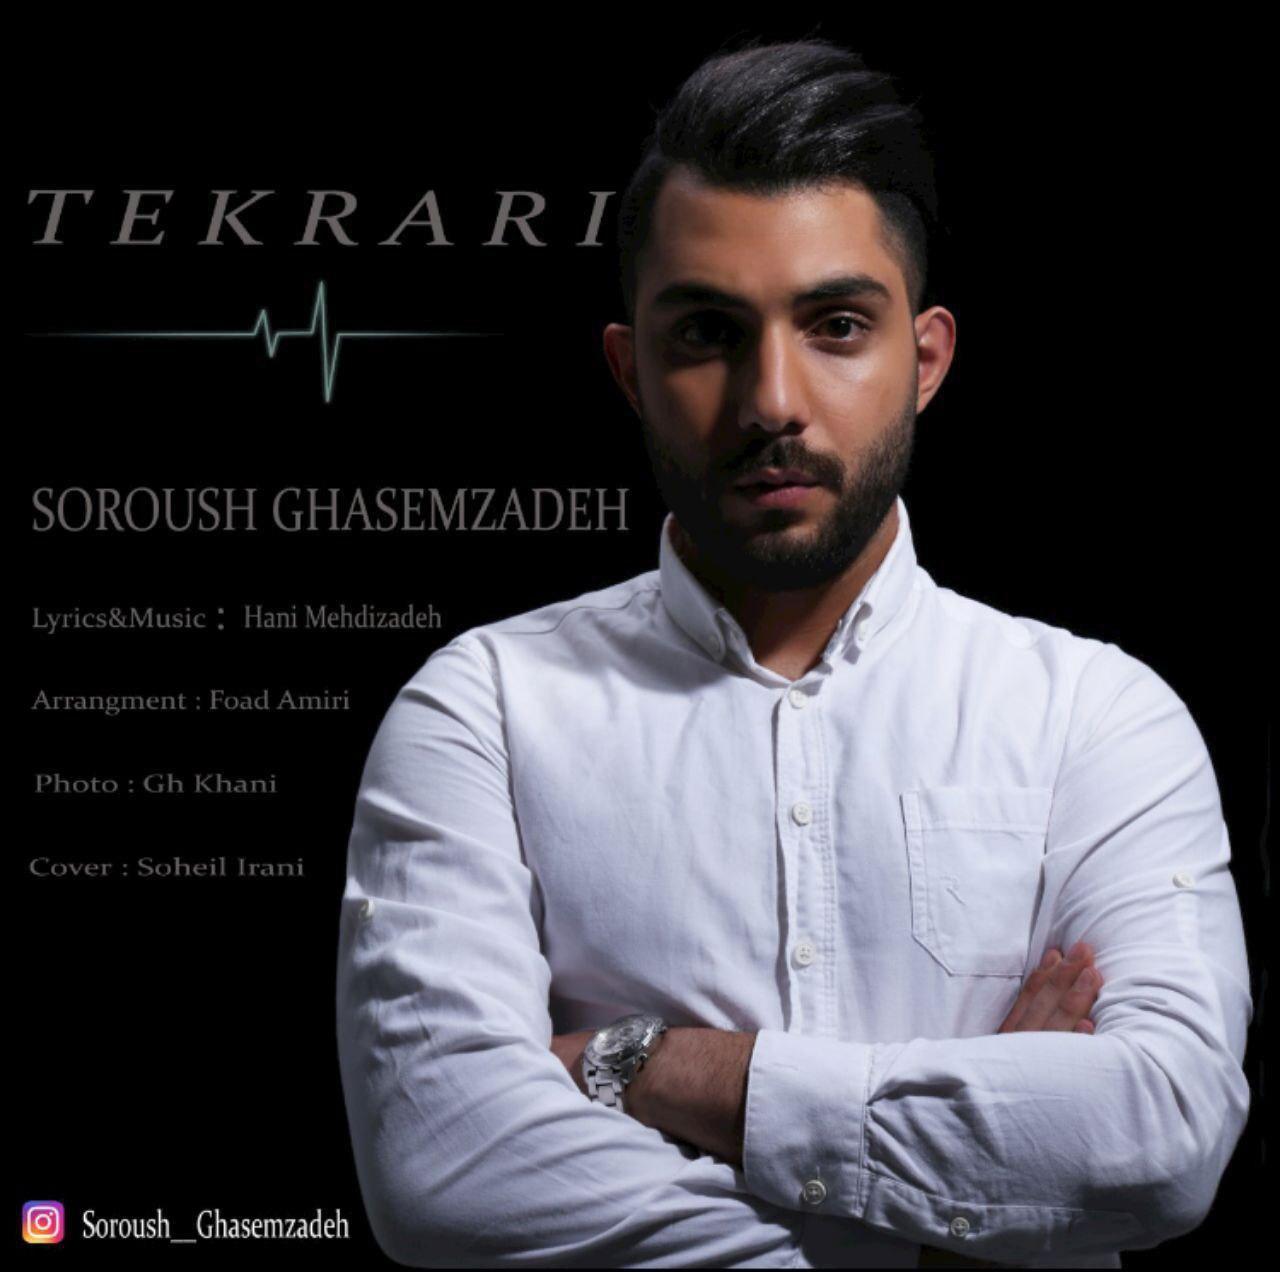 Soroush Ghasemzadeh – Tekrari